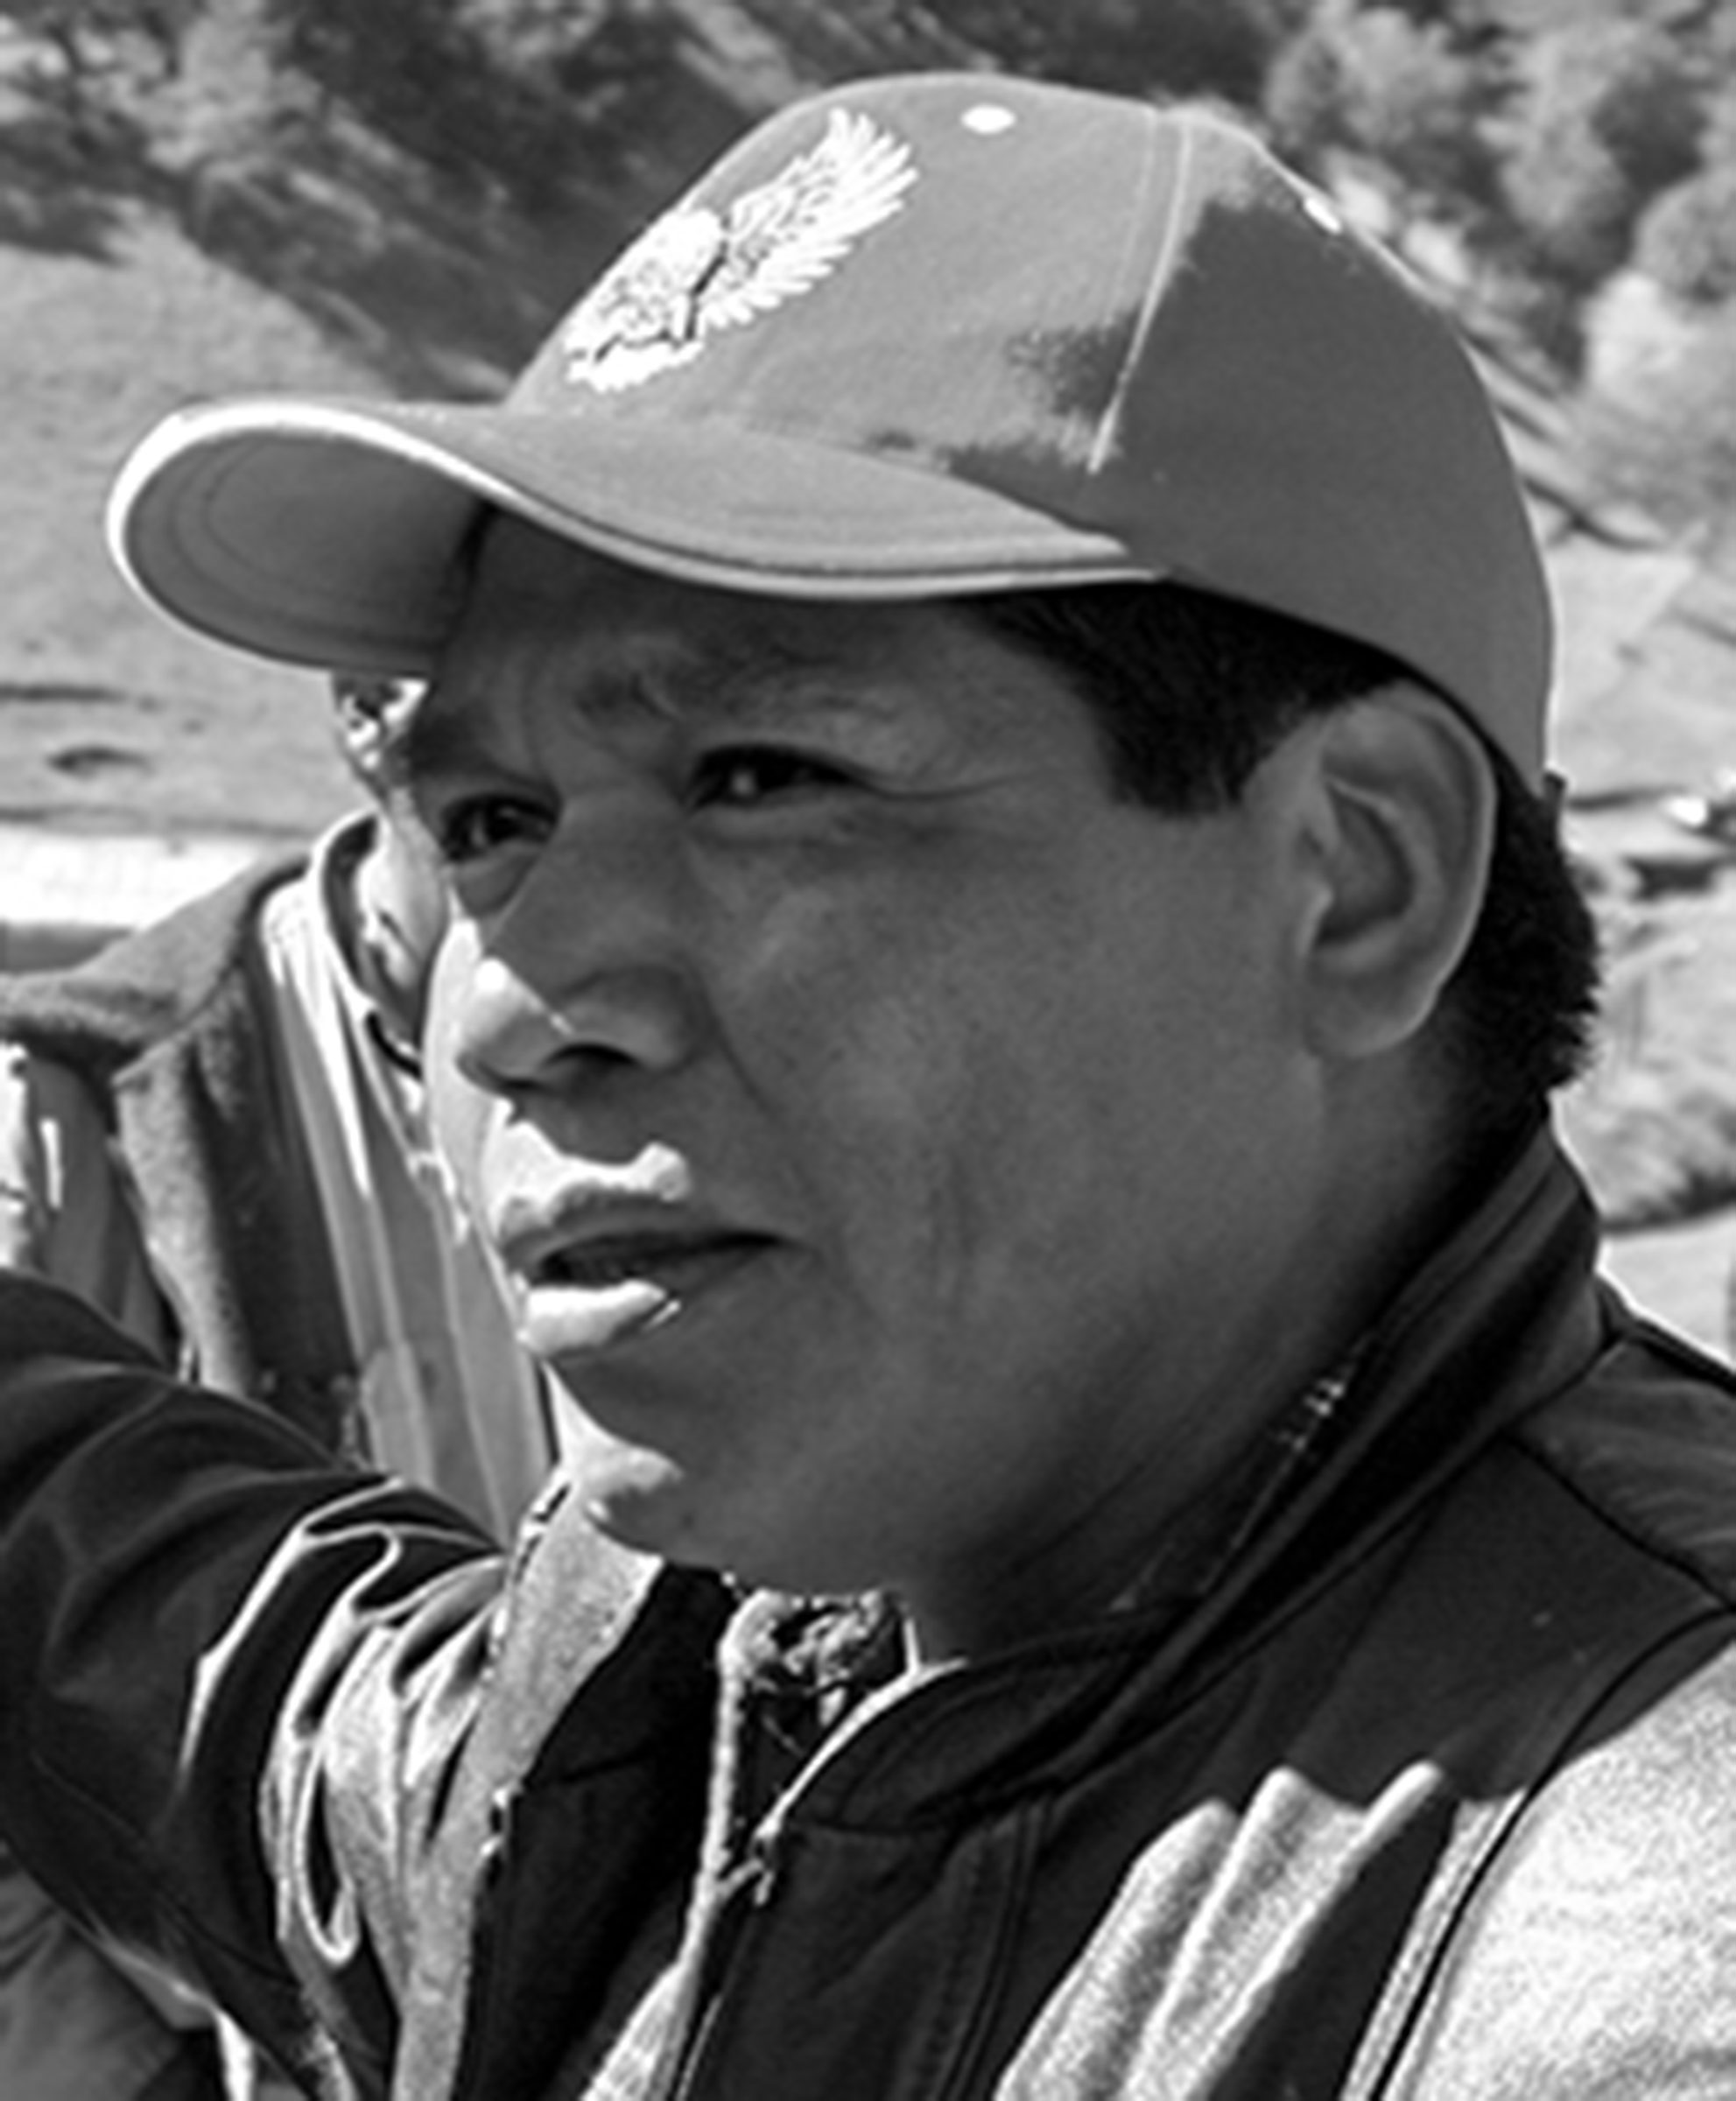 Tarahumara farmer Isidro Baldenegro.